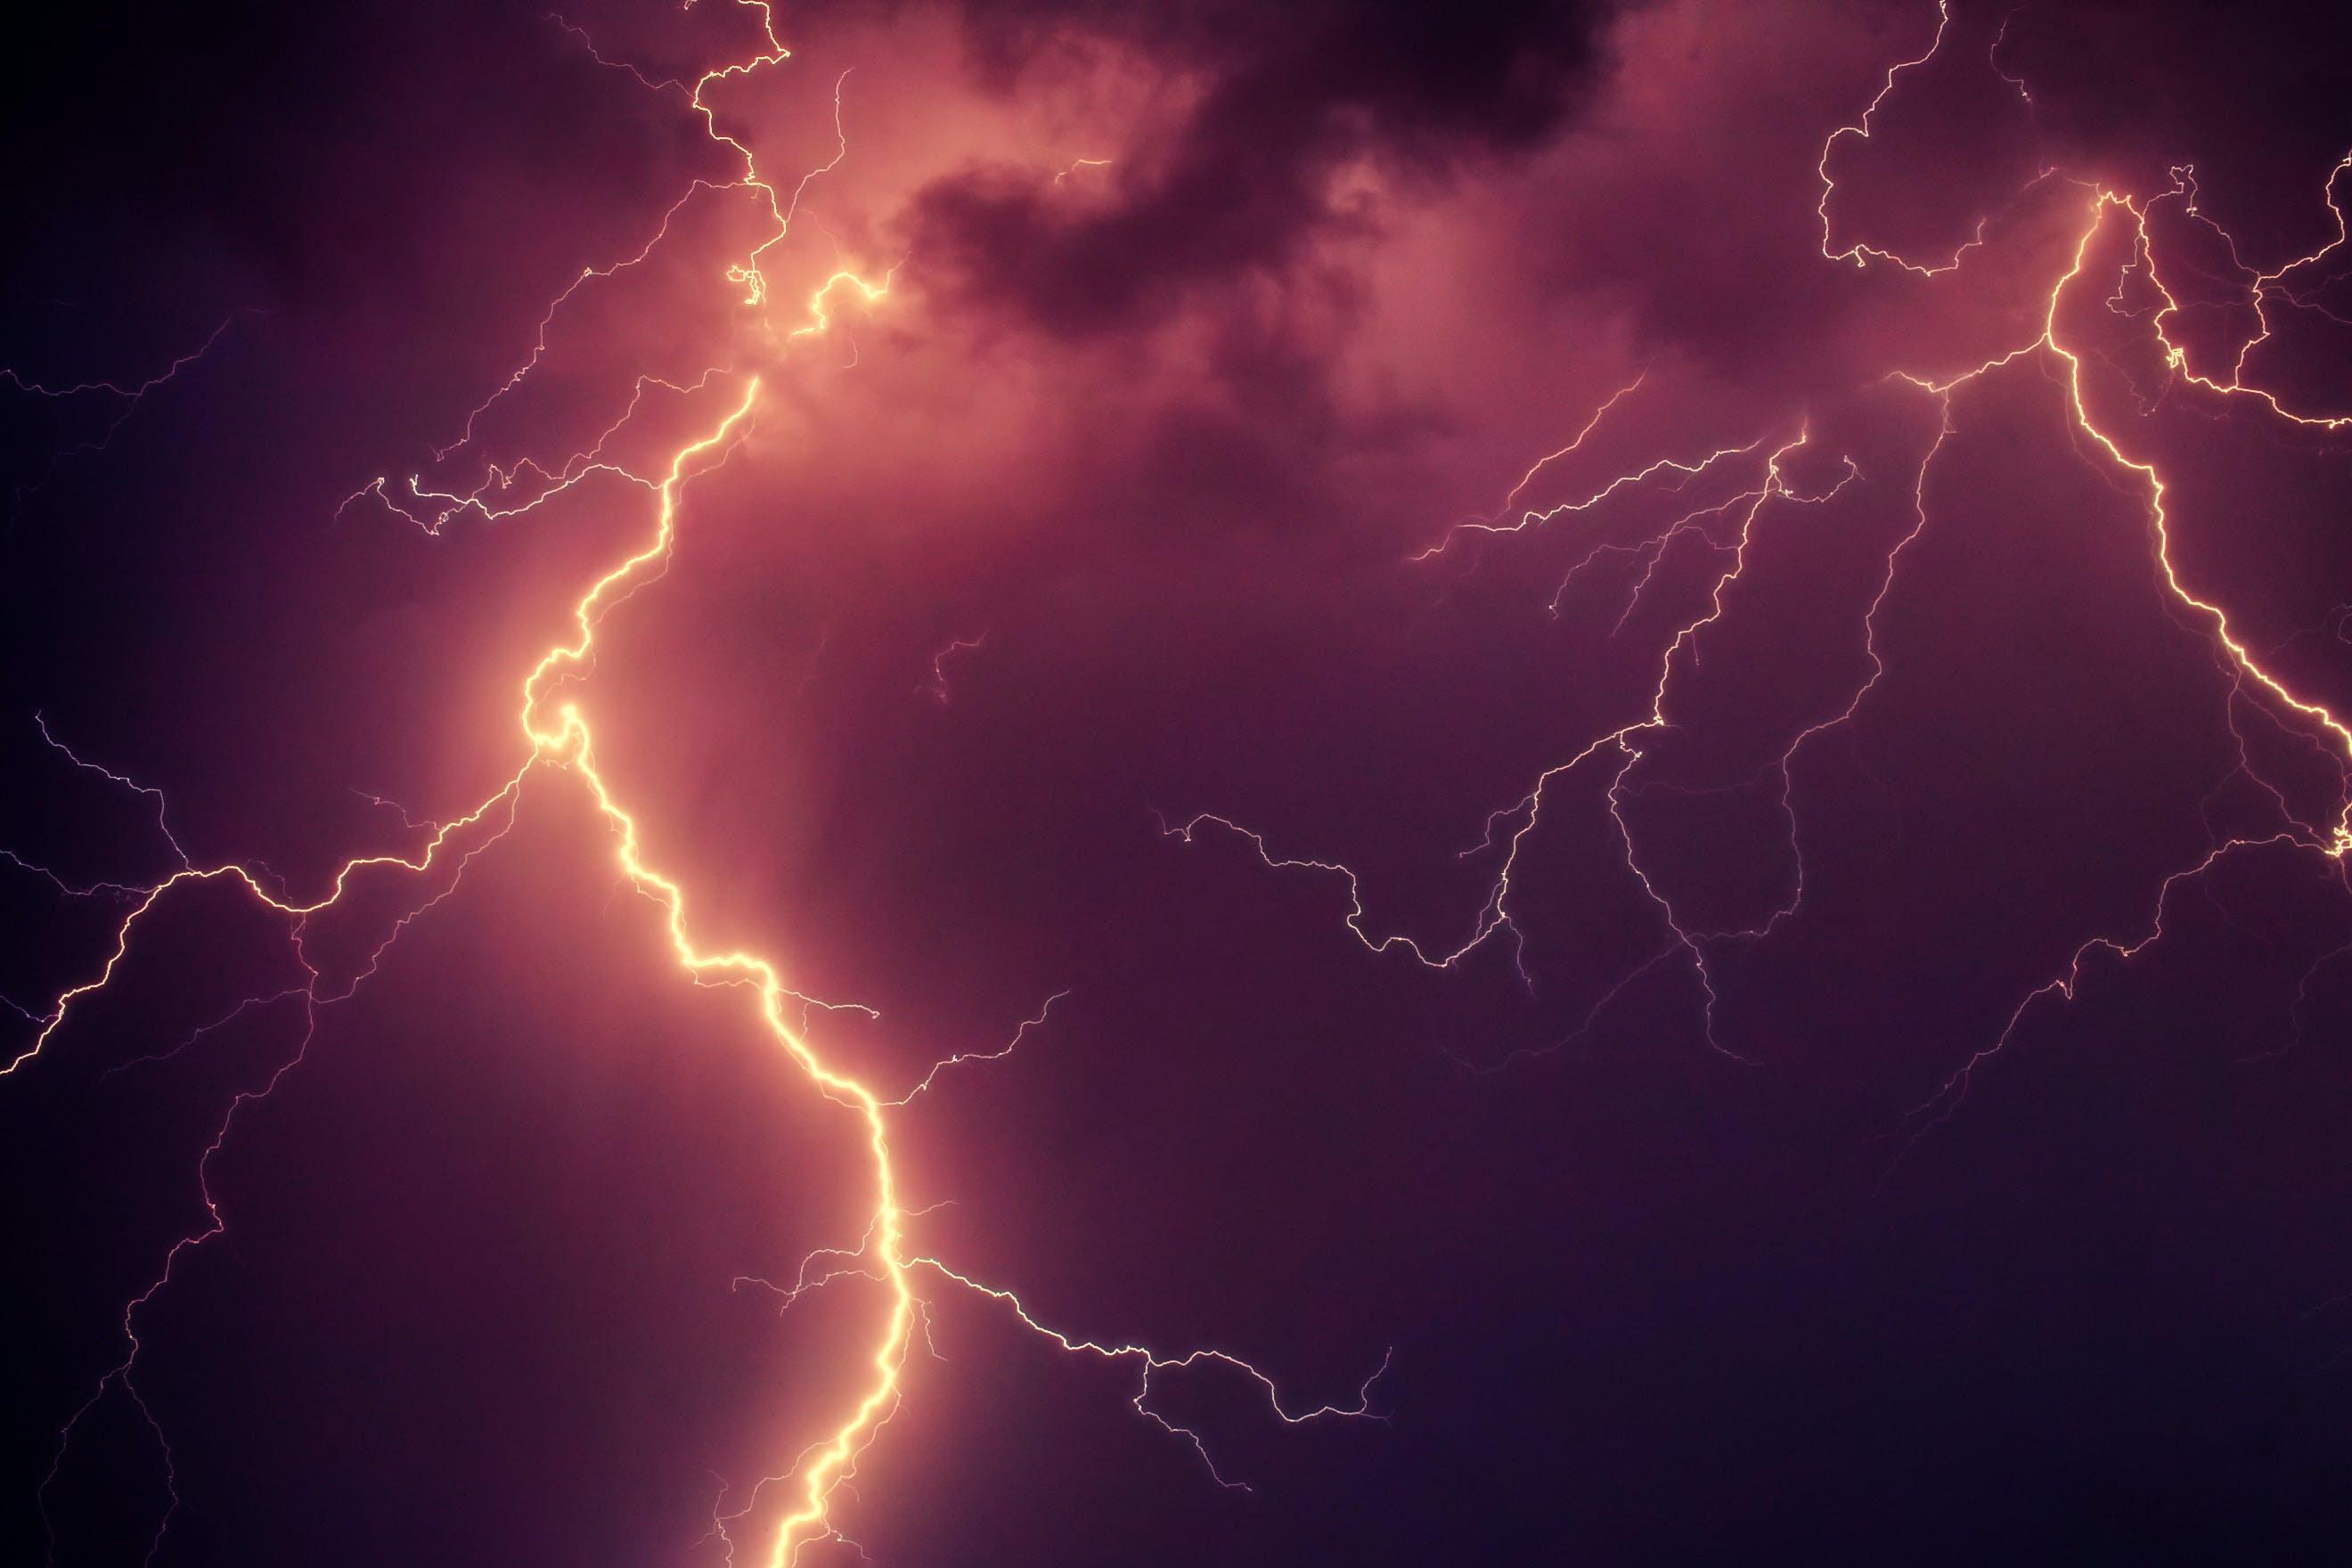 Free stock photo of sky, night, clouds, dark